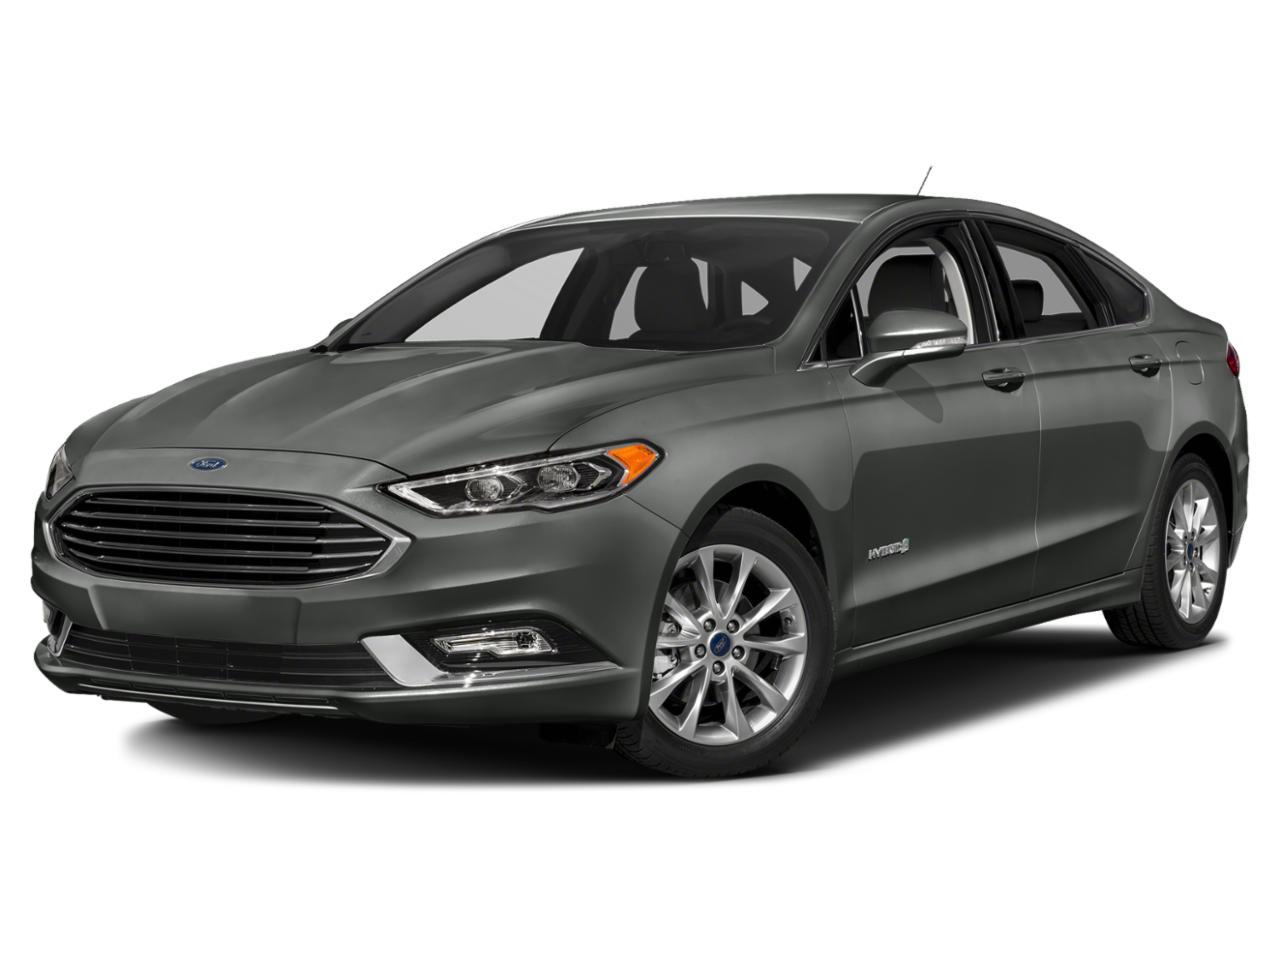 2018 Ford Fusion Hybrid Vehicle Photo in Pleasanton, CA 94588